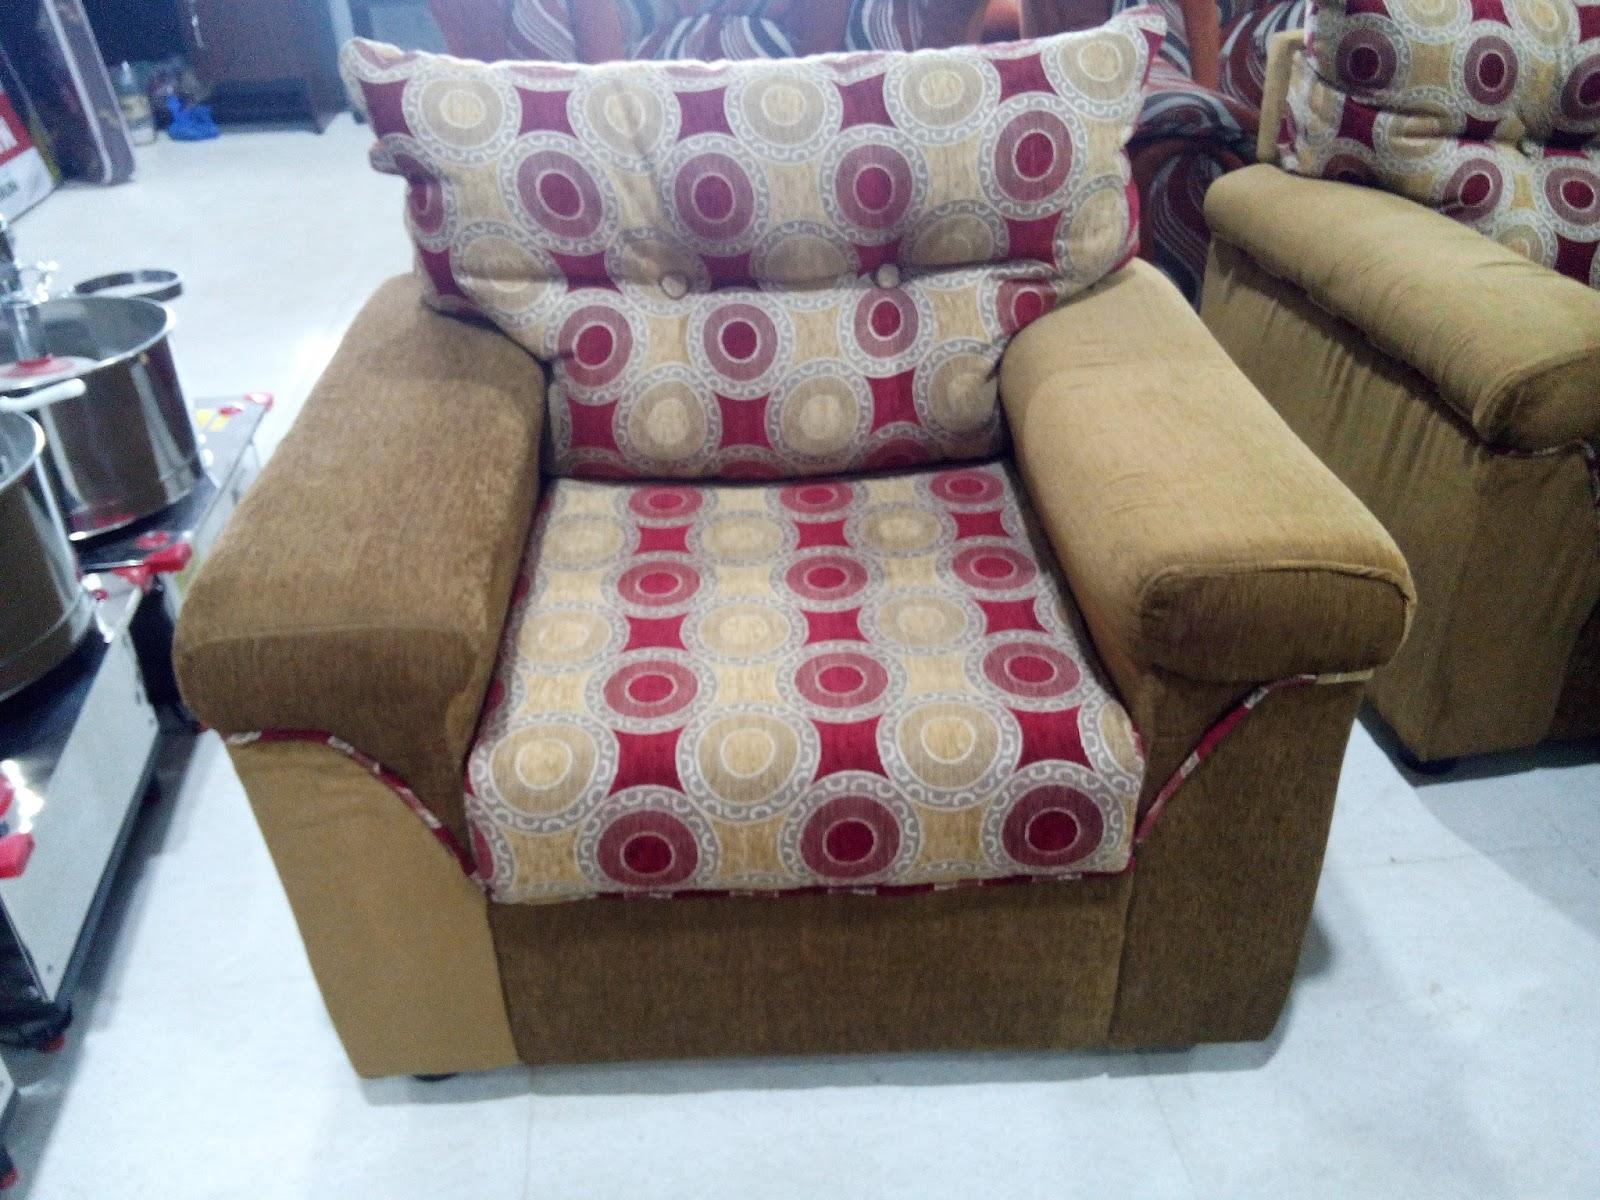 Teak wood cot Steel cot office furniture home  : good2Bsofa2Bfor2Bsale2Bin2Bgobichettipalayam from furnitureforsaleingobichettipalayam.blogspot.com size 1600 x 1200 jpeg 394kB